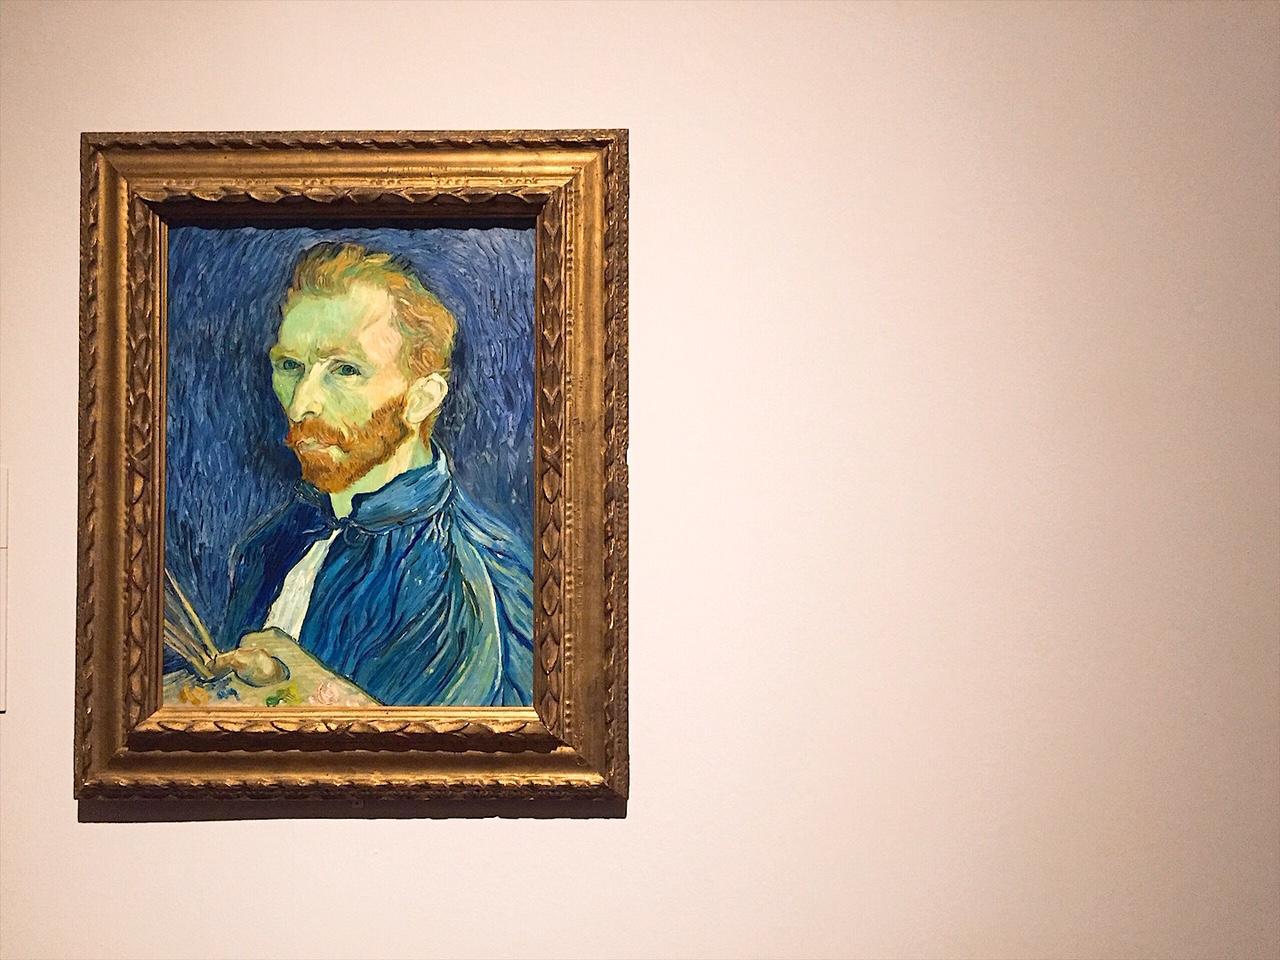 Van Gogh Self-portrait 1889. National Gallery of Art, Washington.